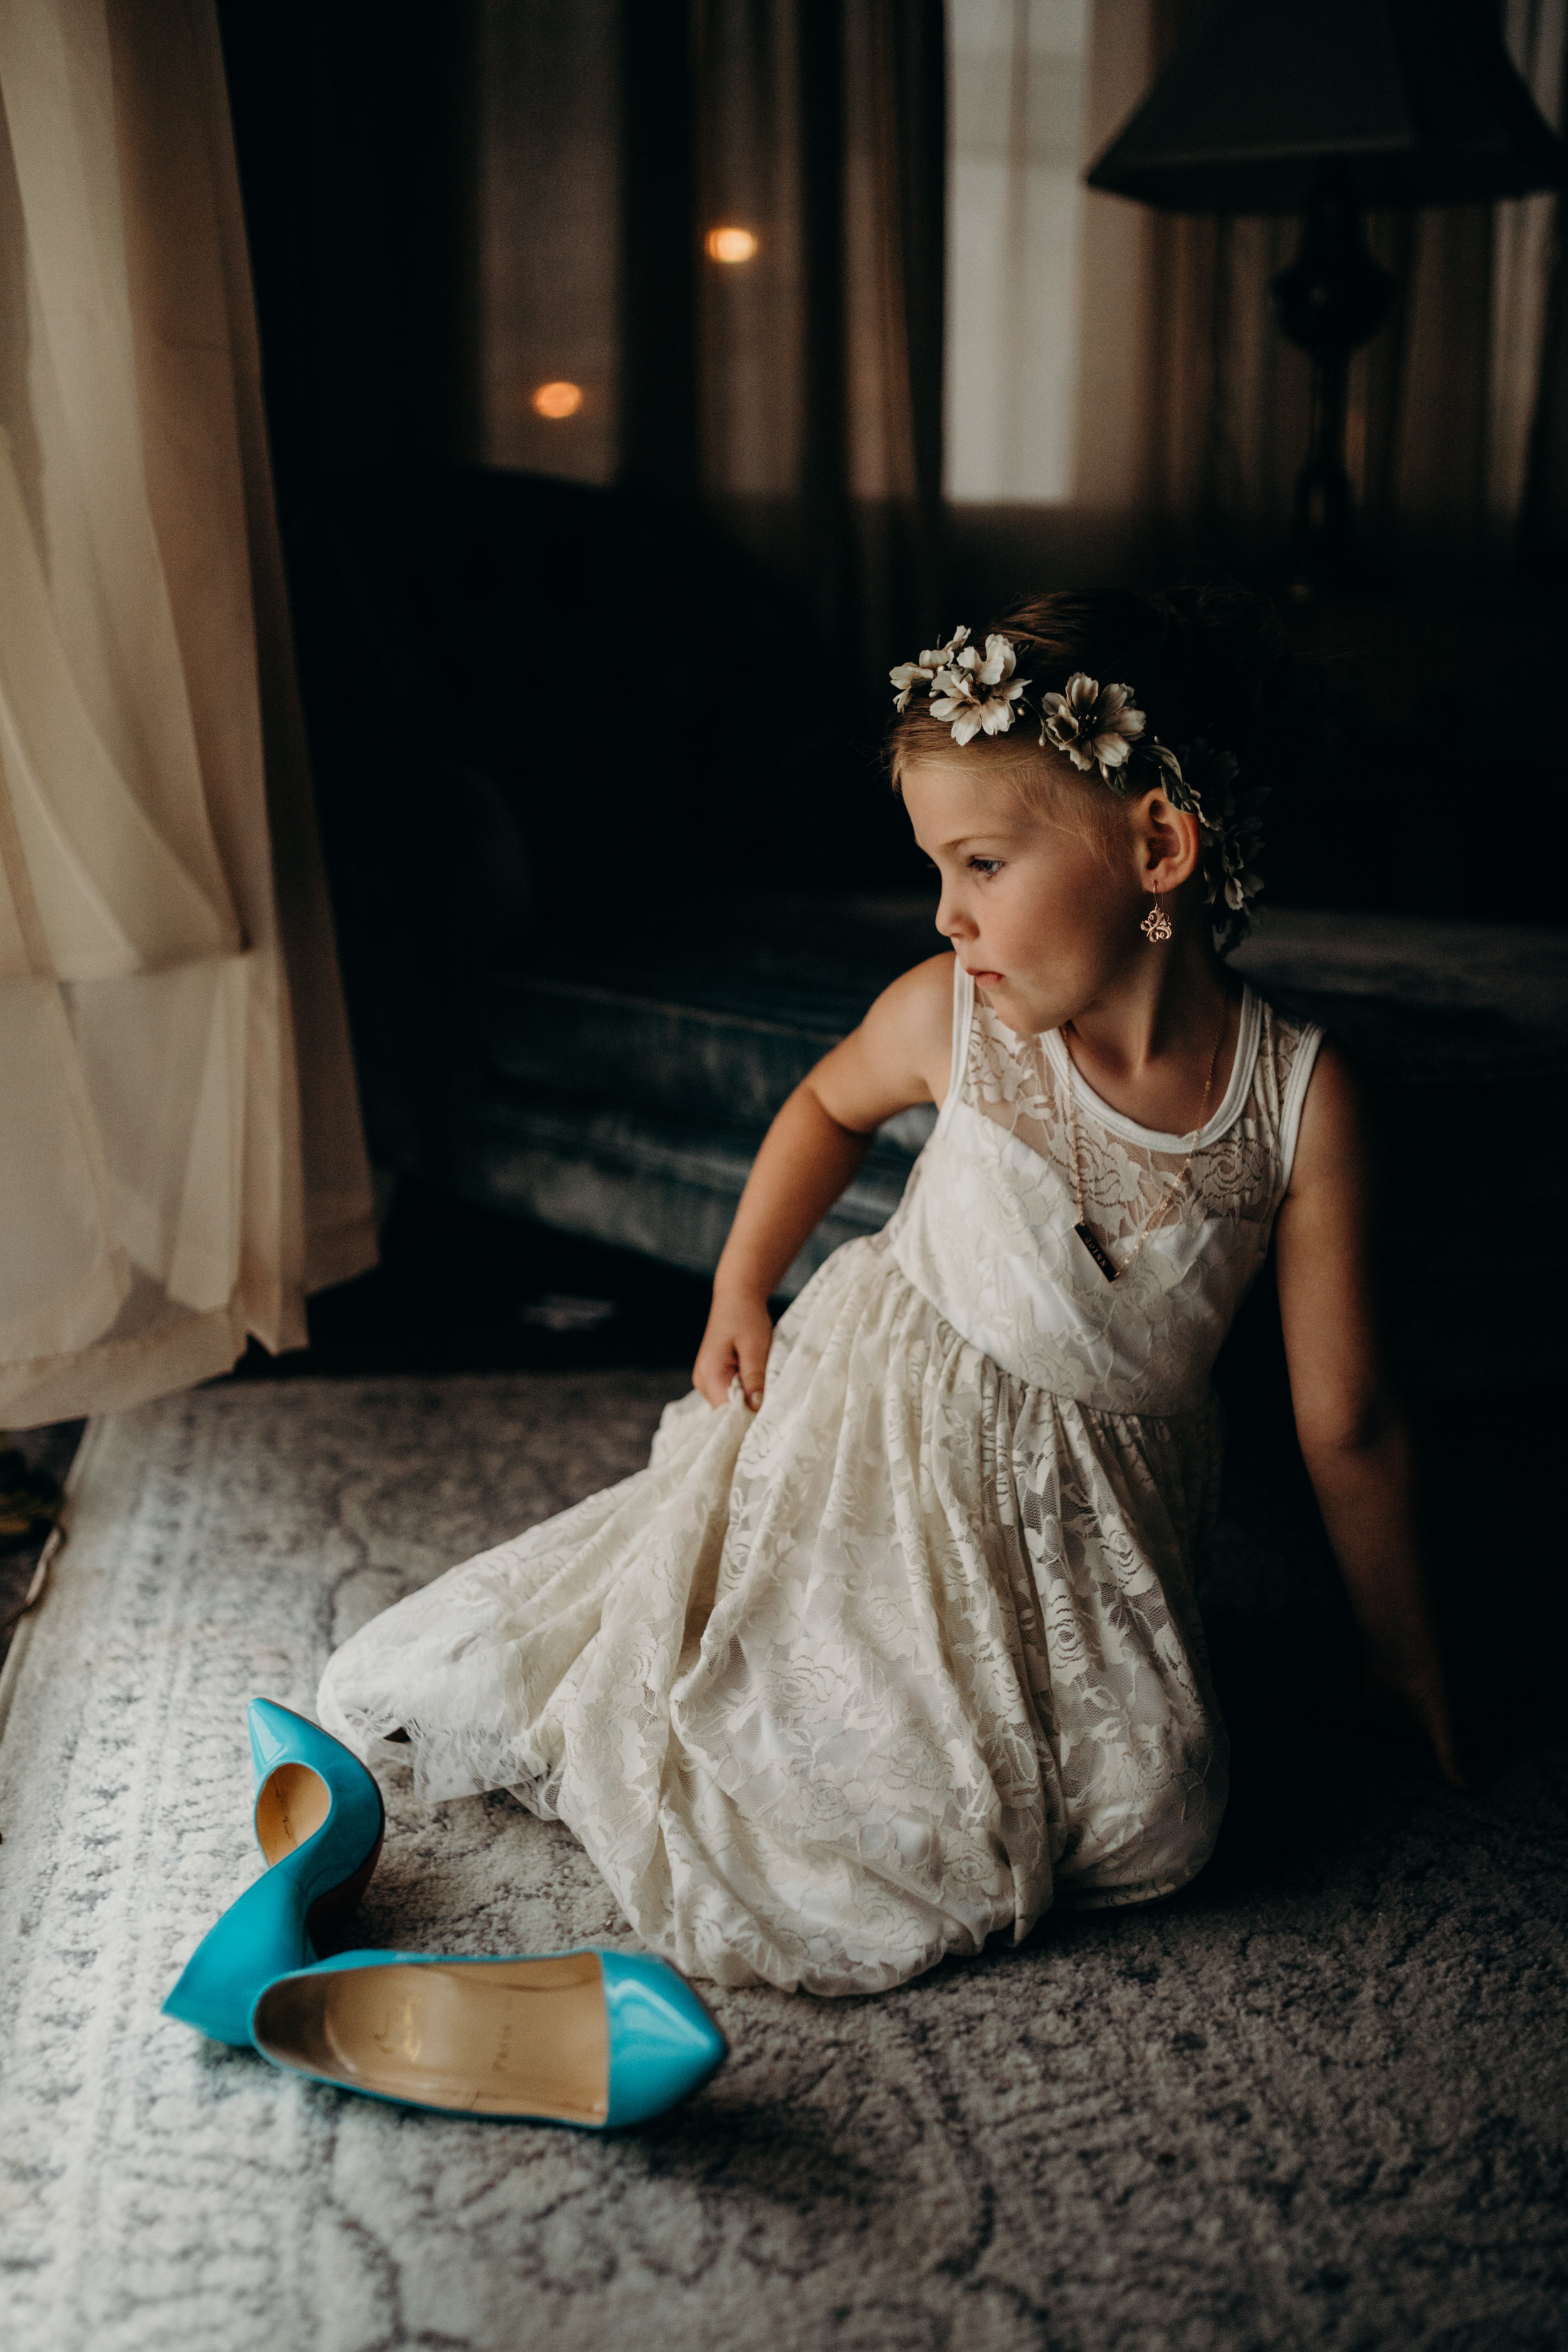 Vintage Wedding_Polly C Photography_20171726152856.jpg